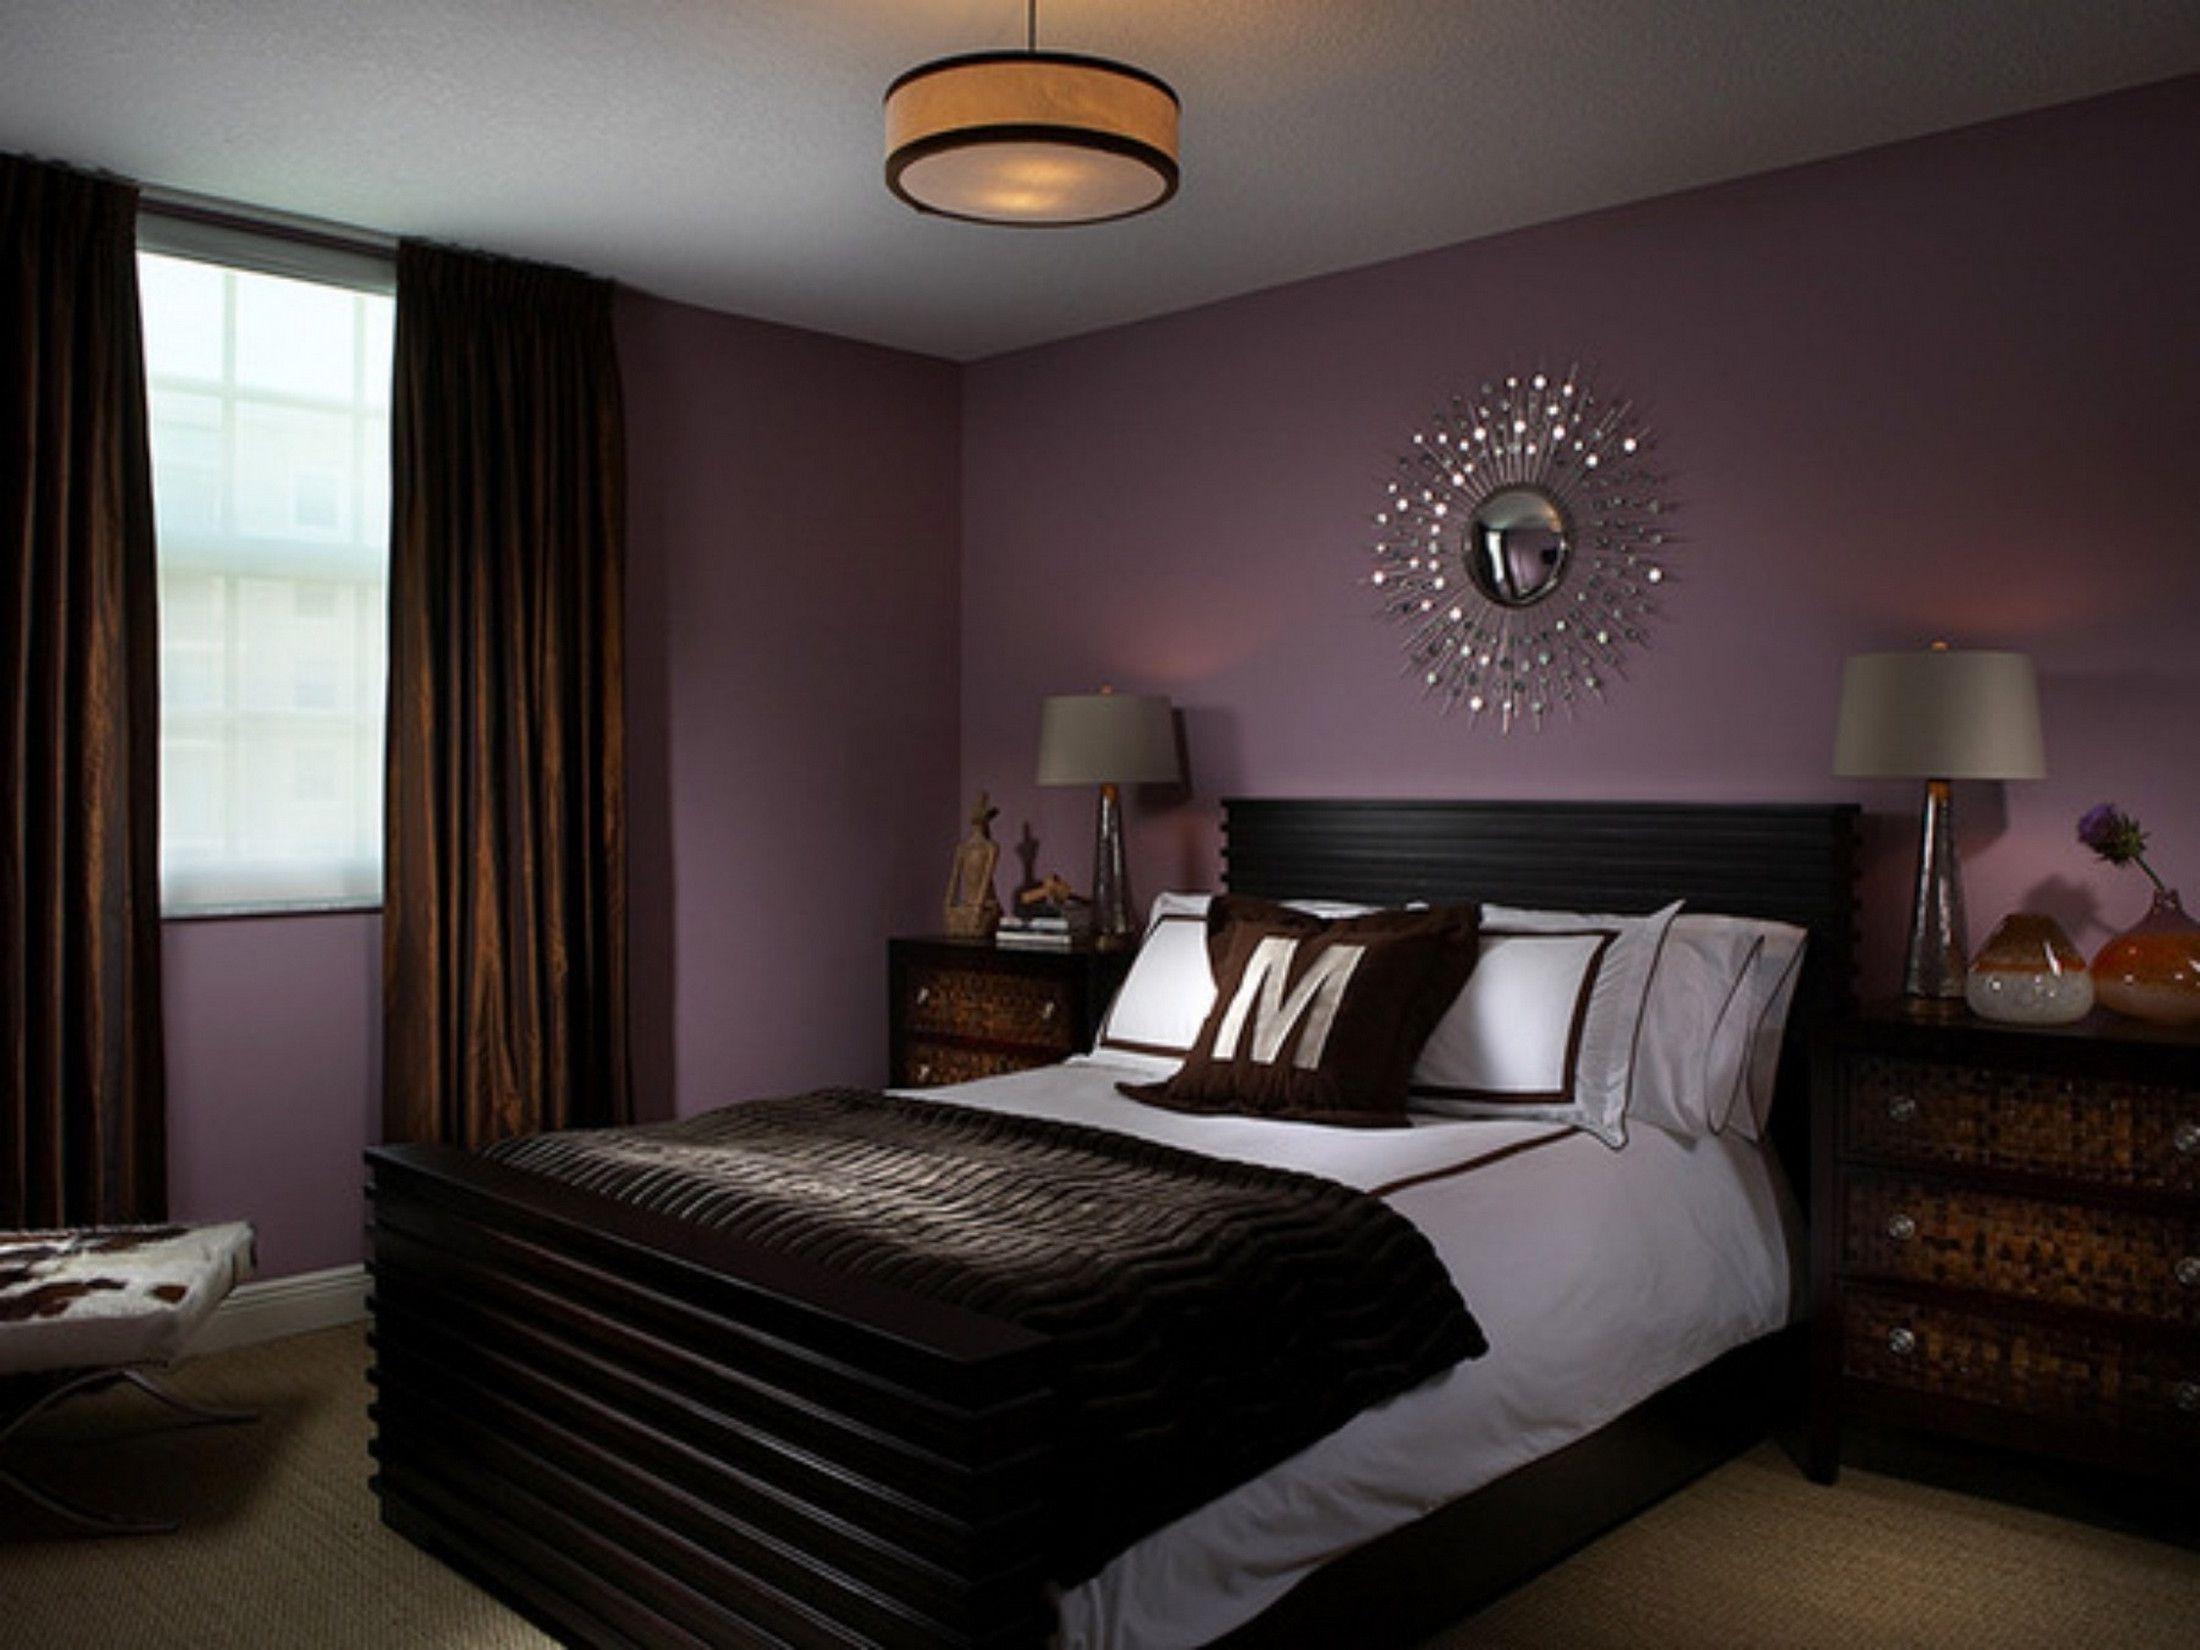 Minimalist Bedroom Ideas To Help You Get Comfortable * * * Men, DIY, Boho